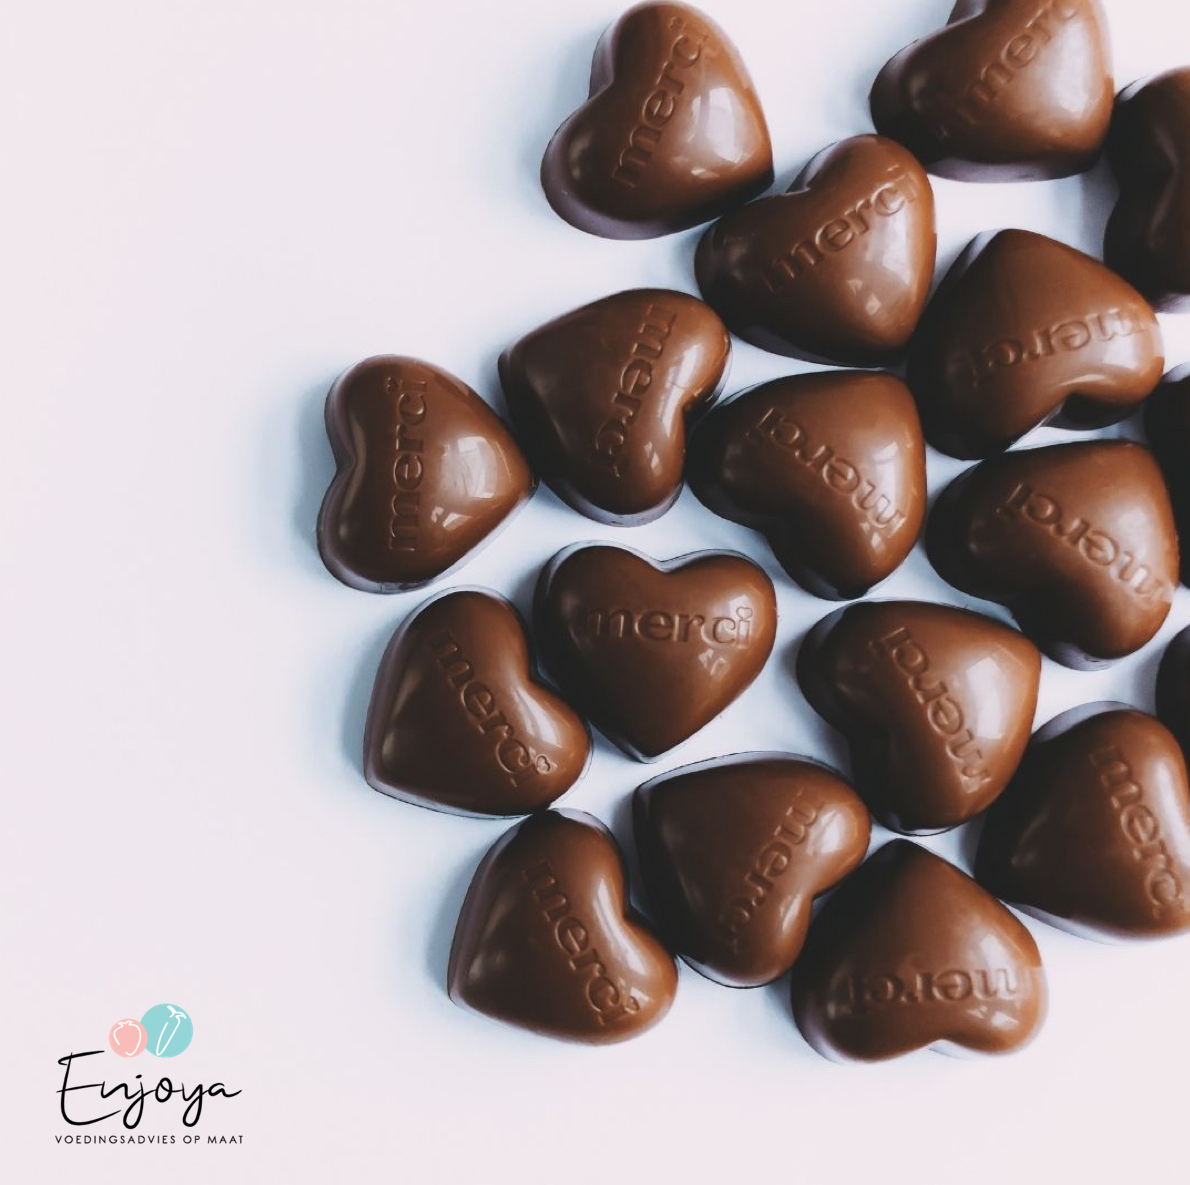 Chocolade gezond?!